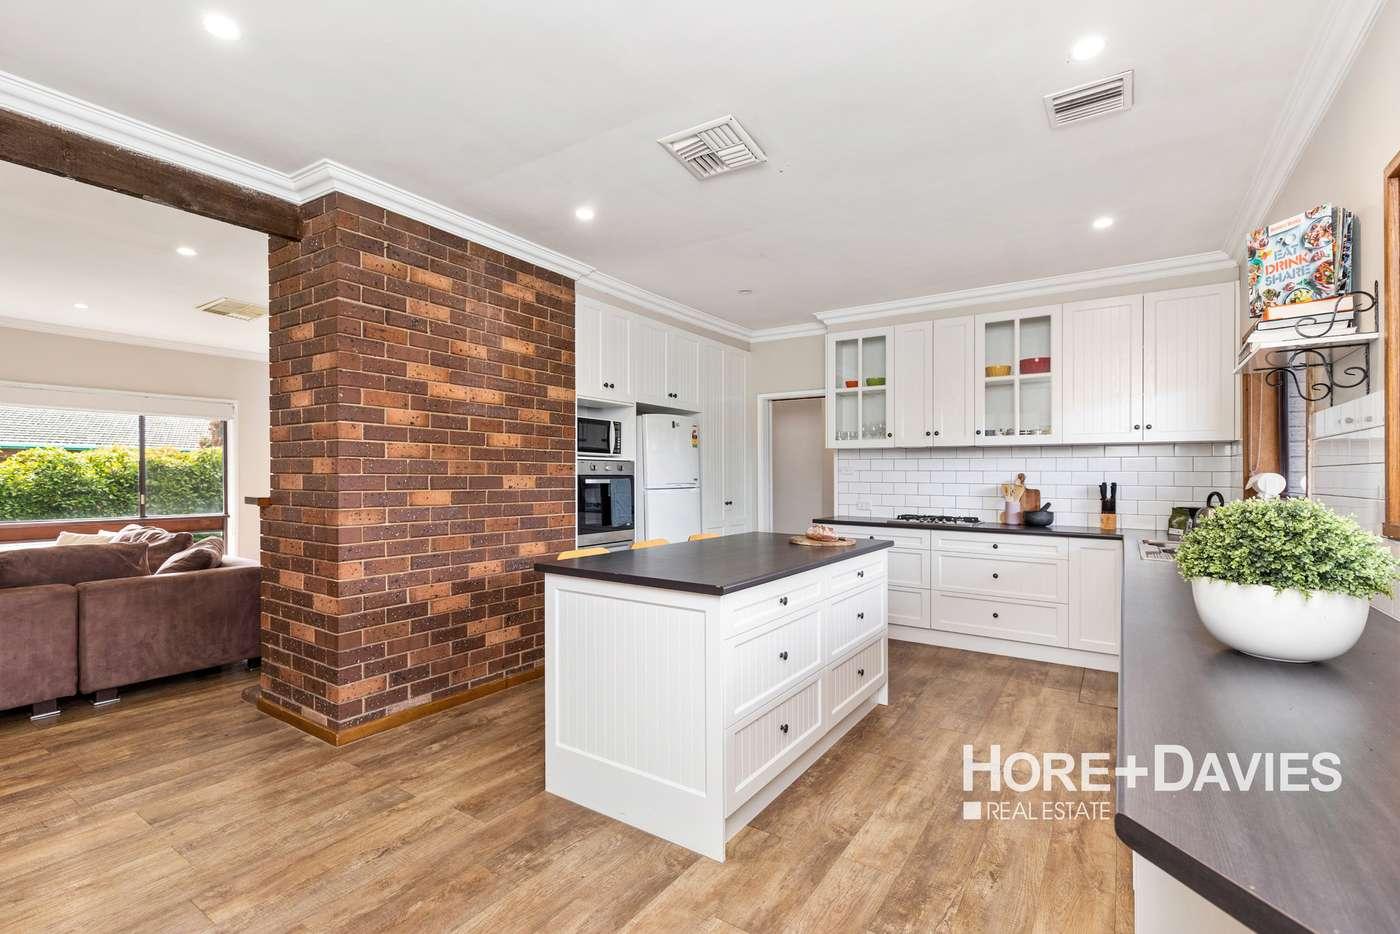 Fifth view of Homely house listing, 257 Kincaid Street, Wagga Wagga NSW 2650